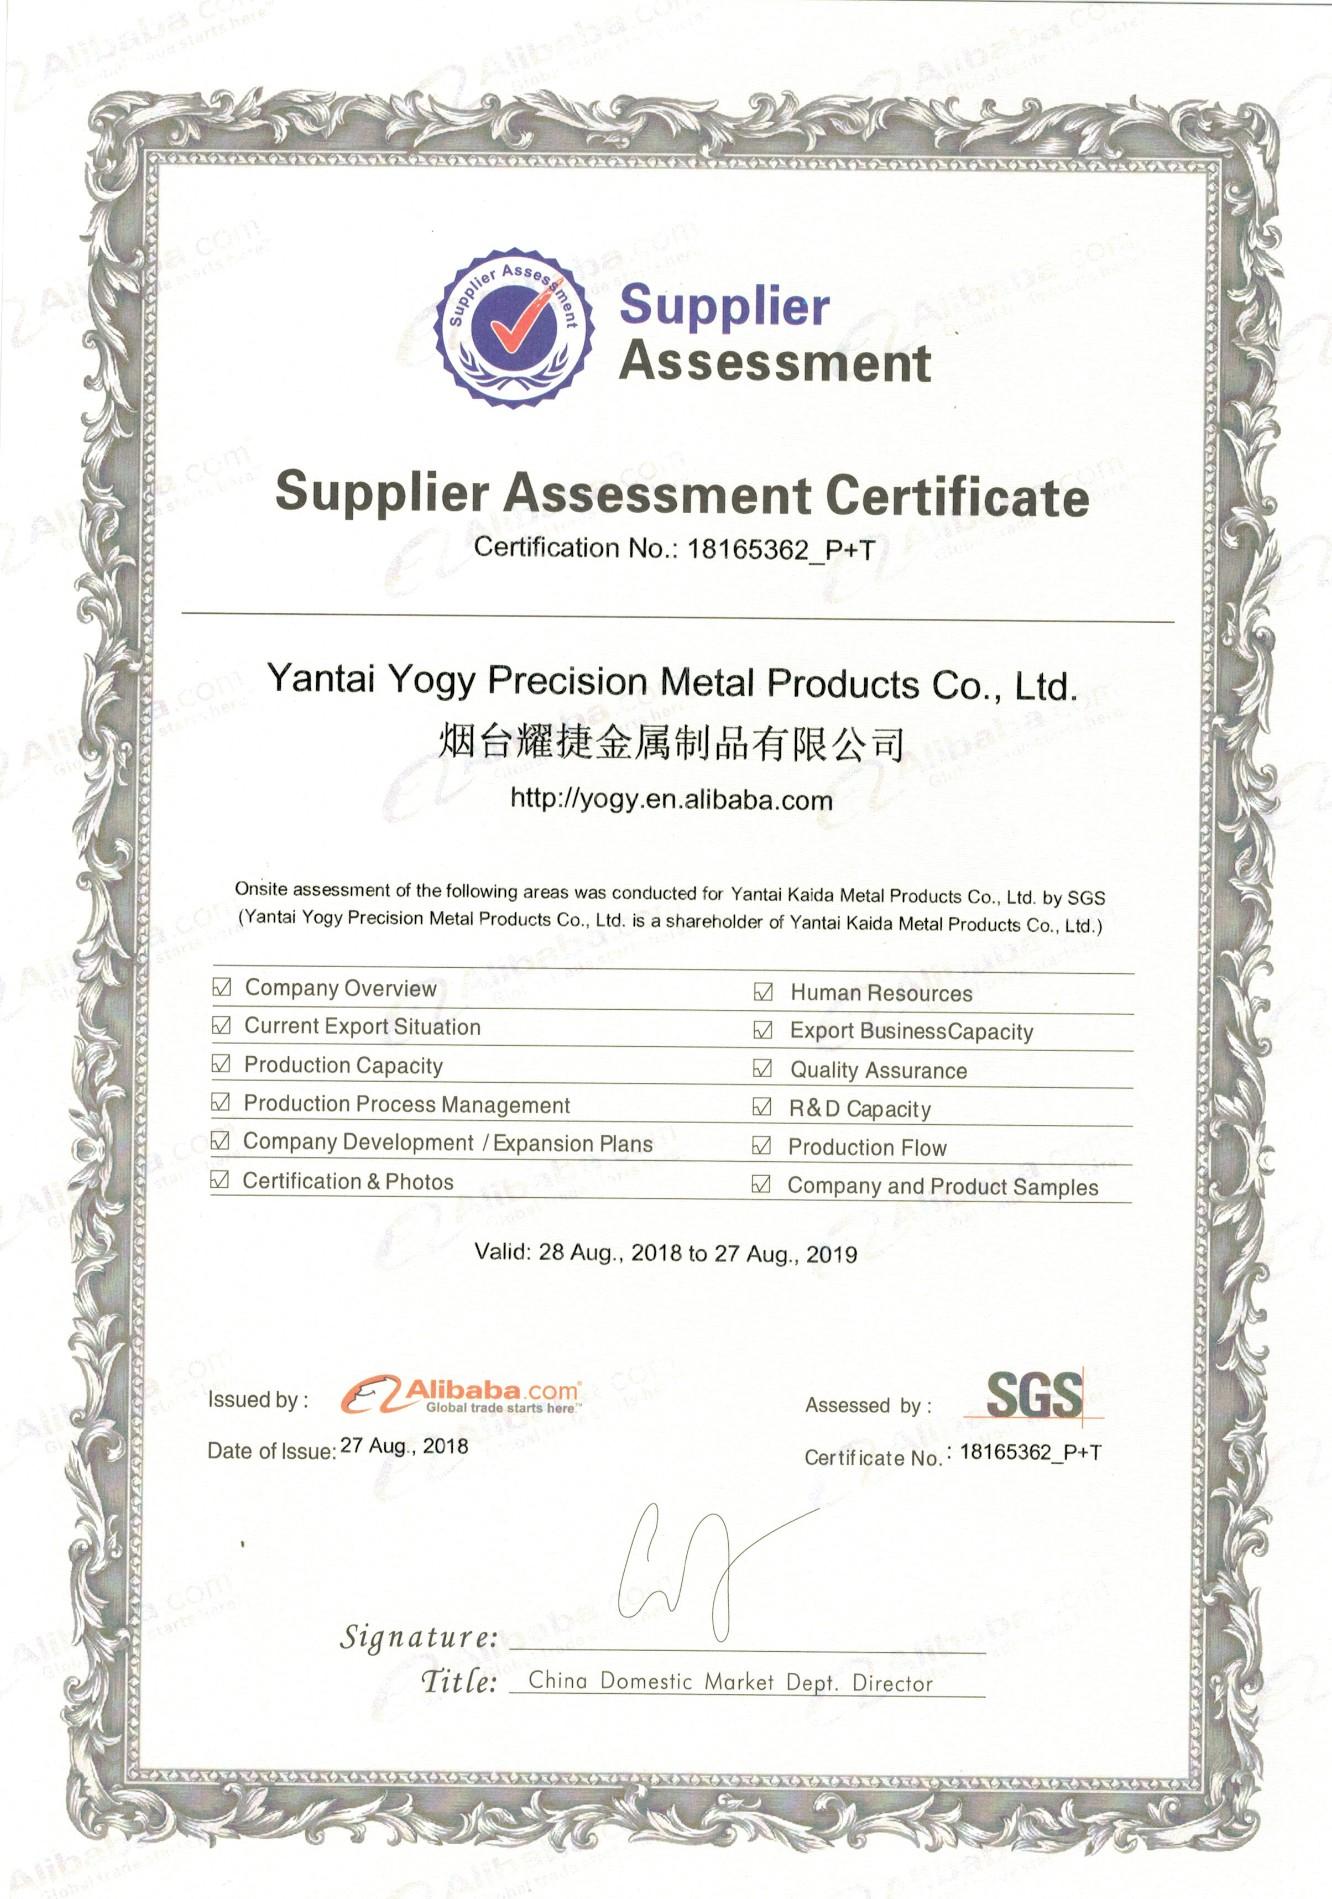 SGS assessment certificate